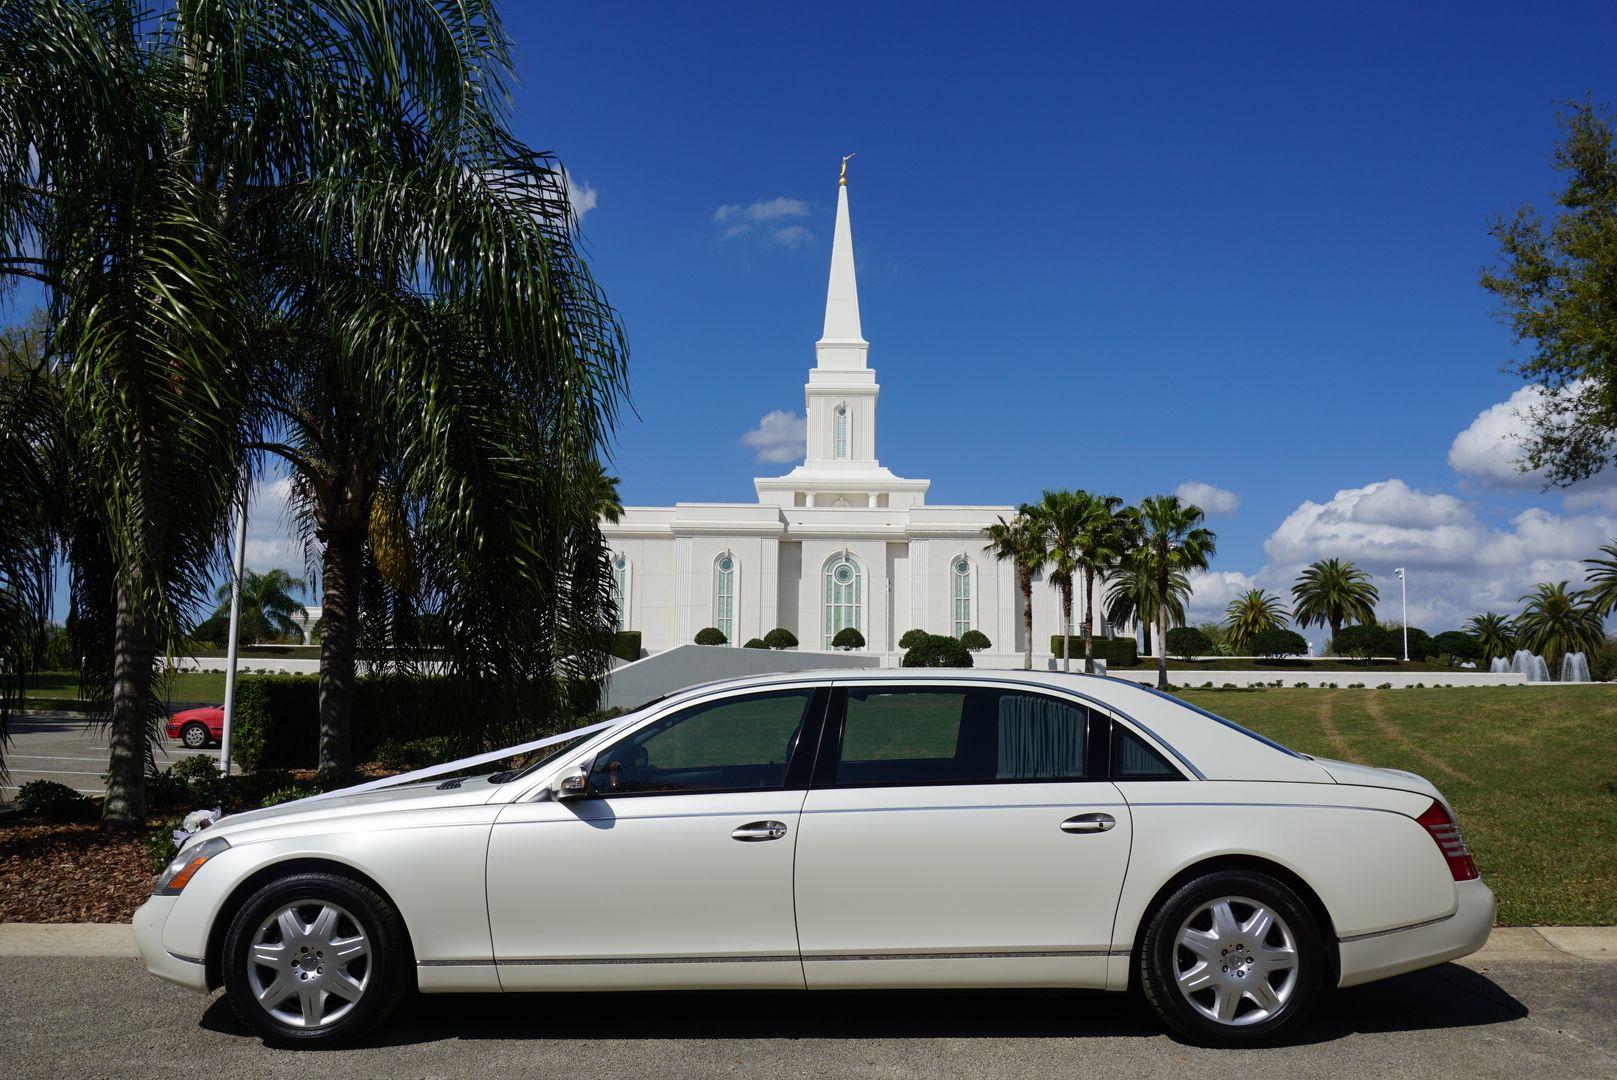 Arrive In A Rolls Royce Phantom On Your Wedding Day We Have The Finest Luxury Rolls Royce Limousine Rental Wedding Car